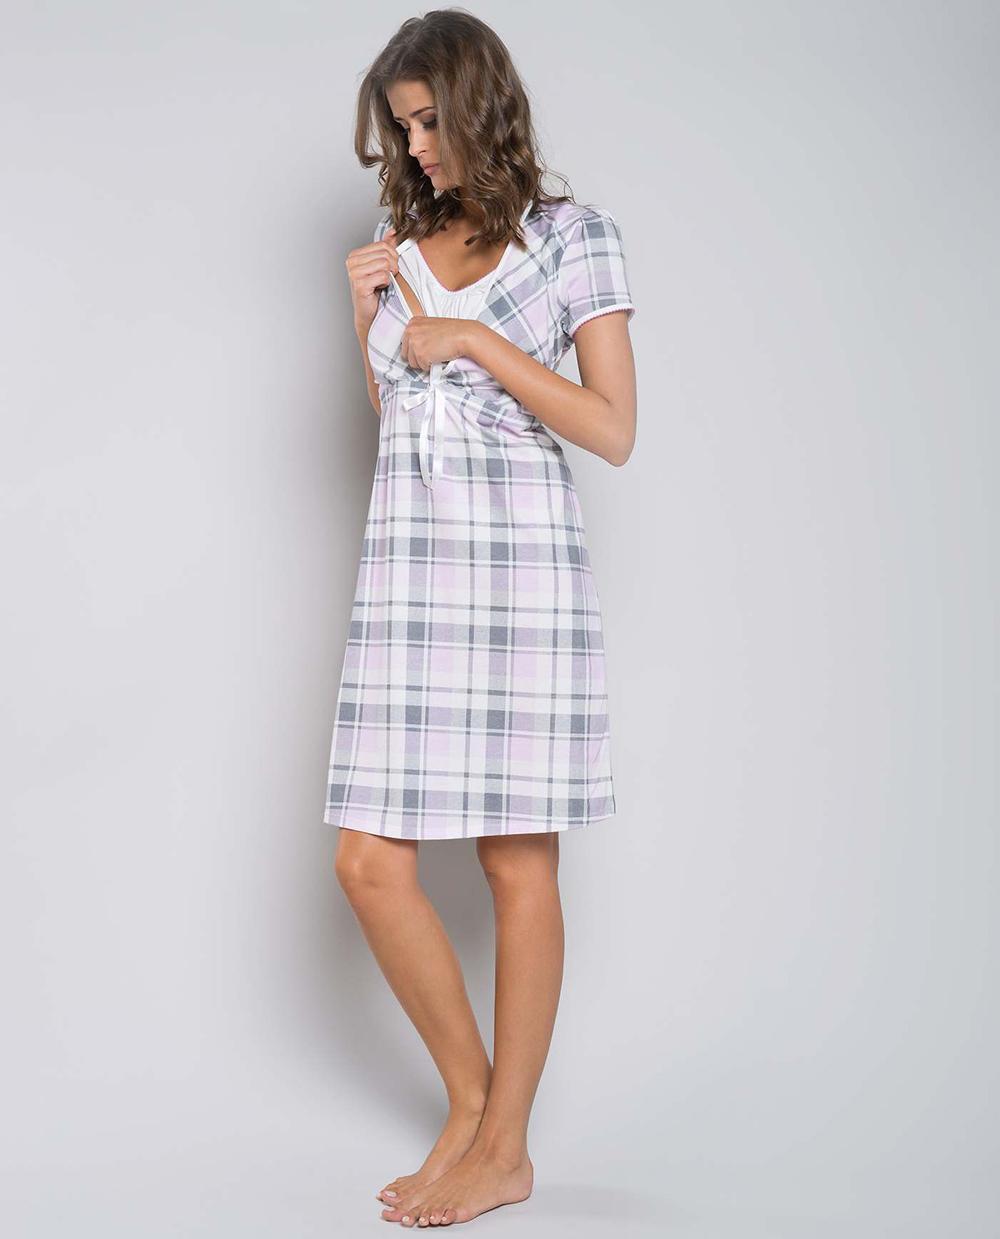 4e6d2473b94712 Koszula nocna Italian Fashion HANA kr.ręk. kratka. Koszula ciążowa. Koszula  ciążowa · Koszula ciążowa · Koszula ciążowa · Koszula karmienie